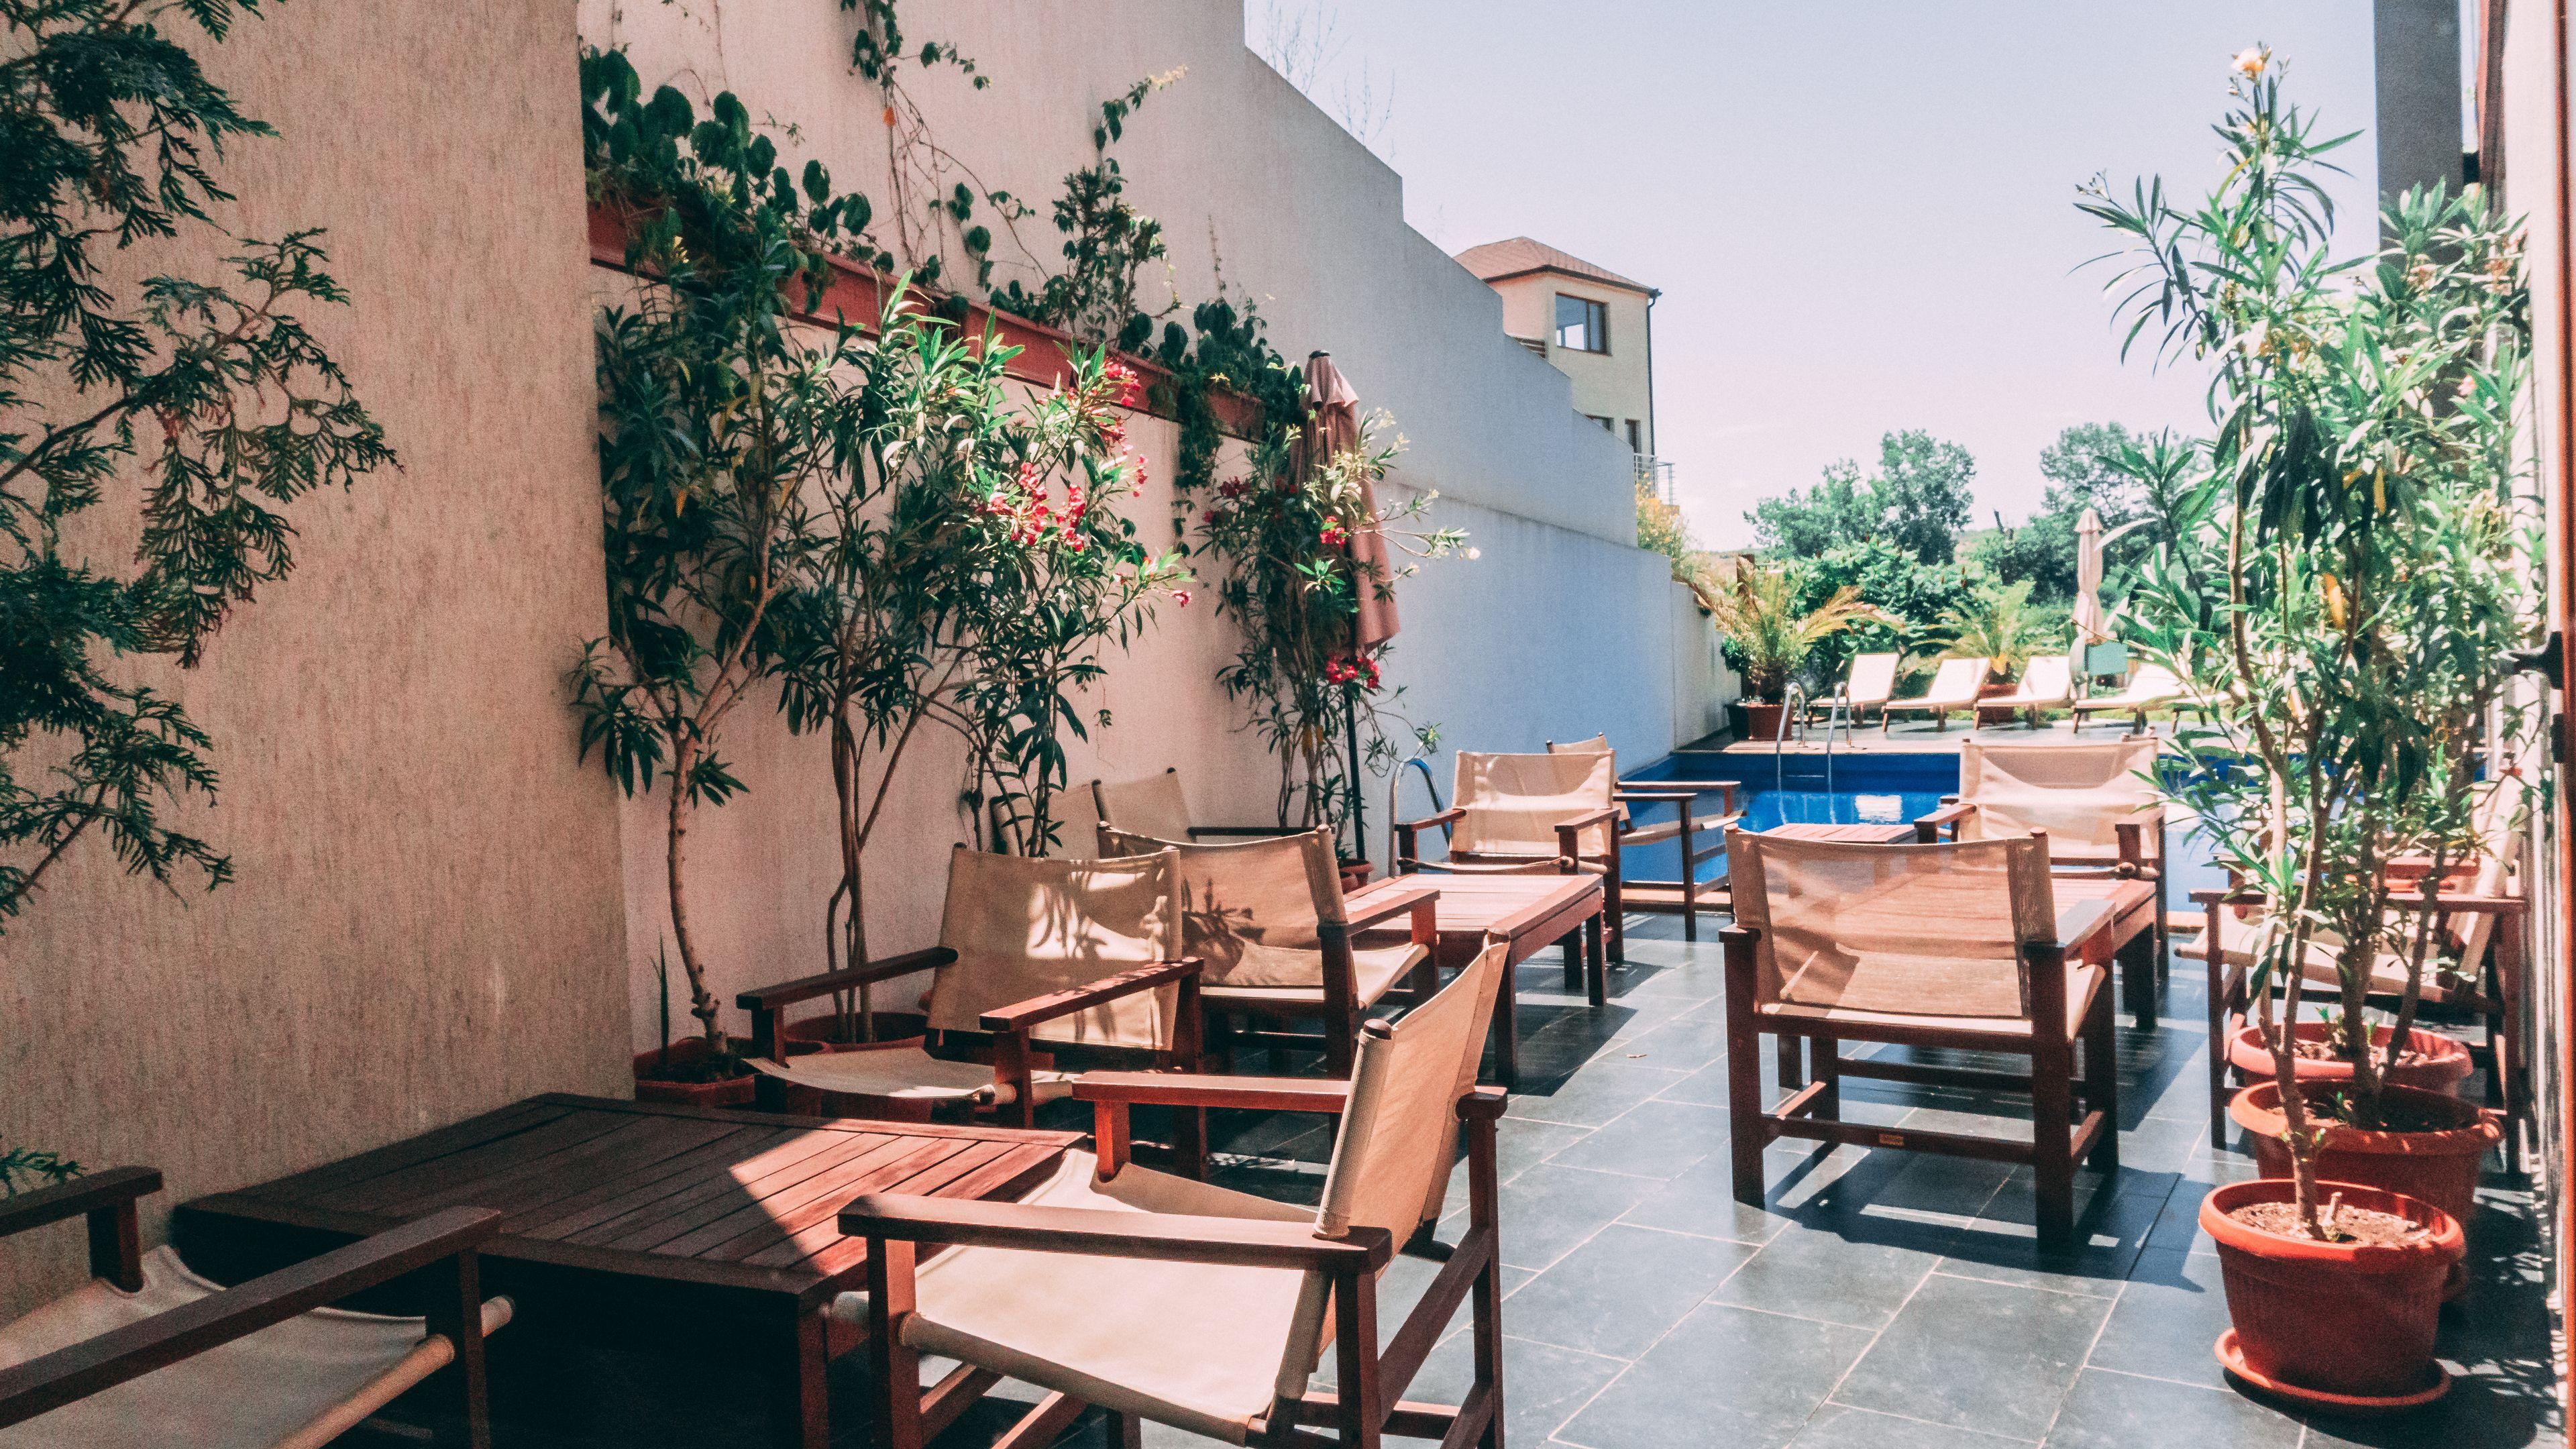 Courtesy of Design Hotel Logatero / Expedia